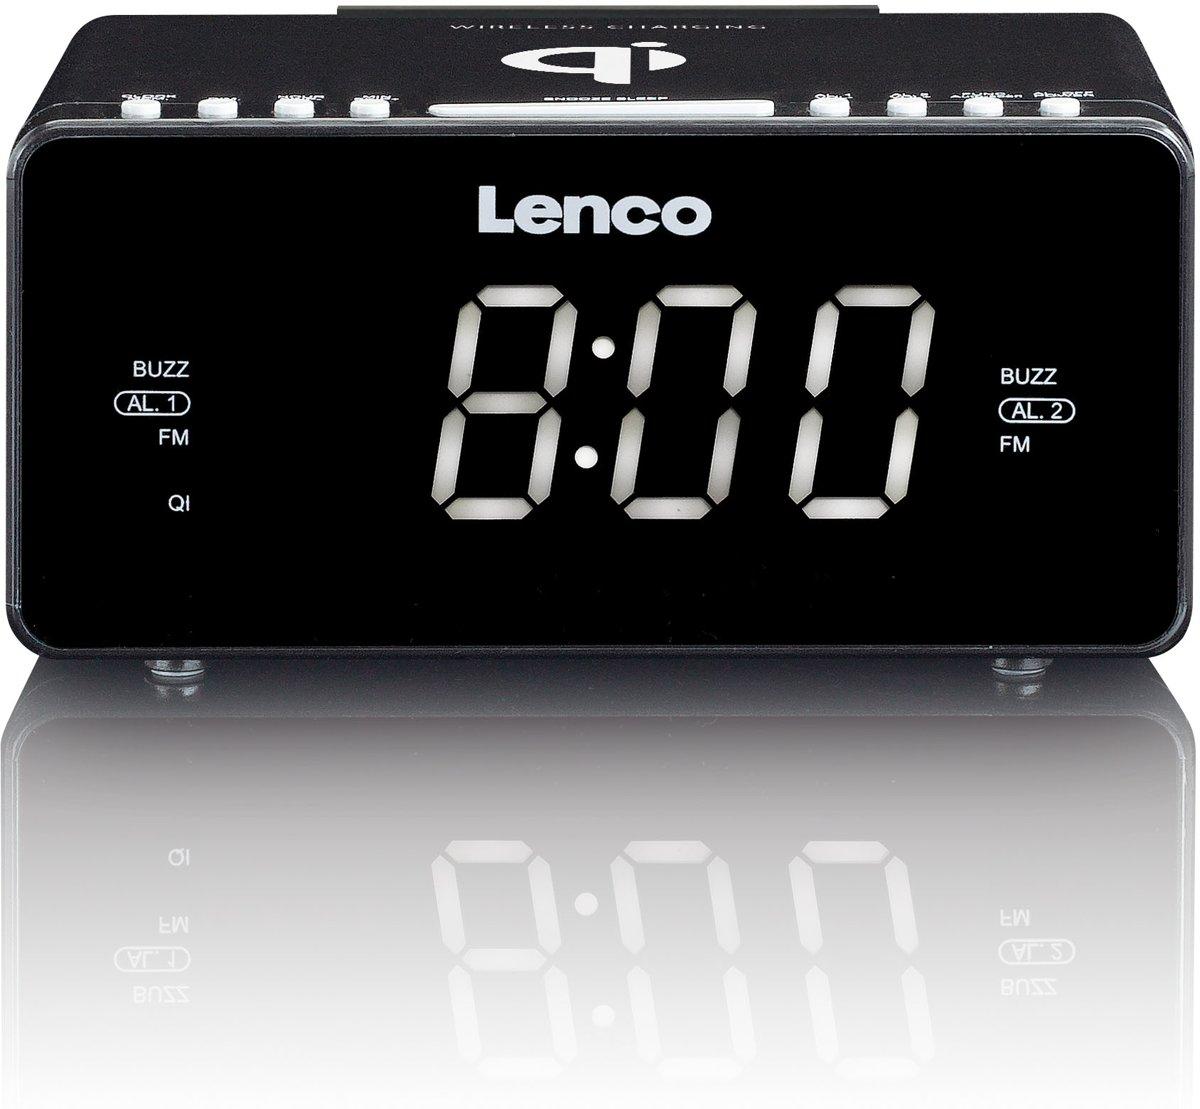 Lenco CR-550 Wekkerradio €15,64 @ Amazon.nl